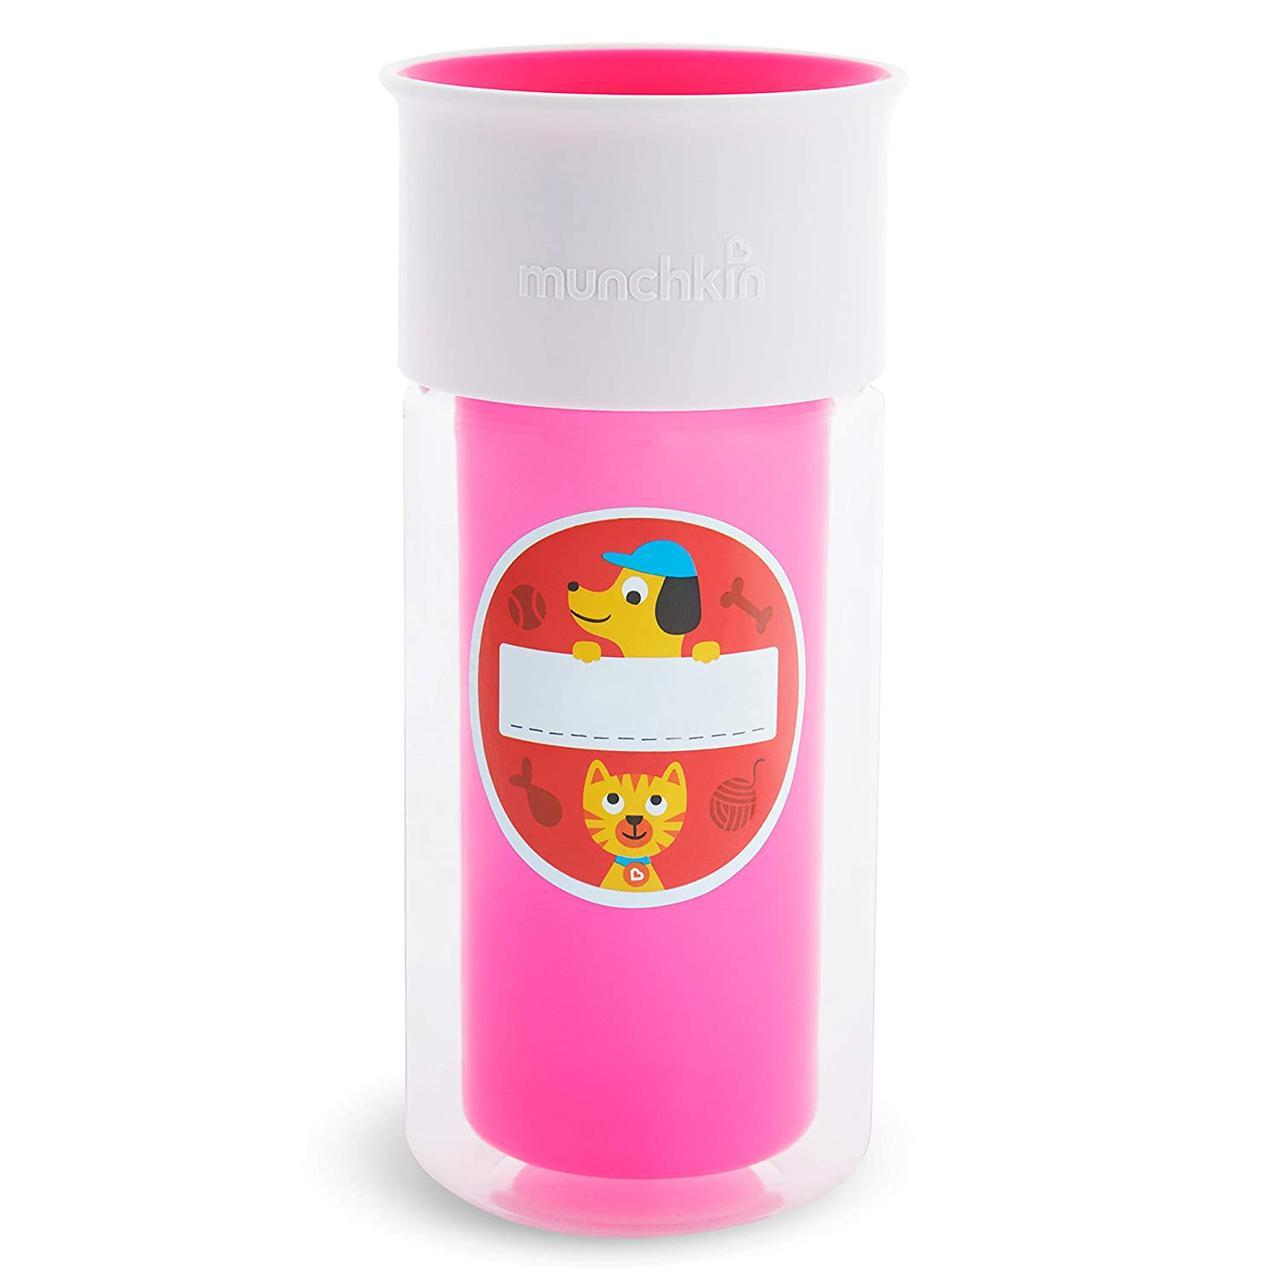 Бутылка непроливная Munchkin Miracle 360 Insulated Sticker, 266 мл